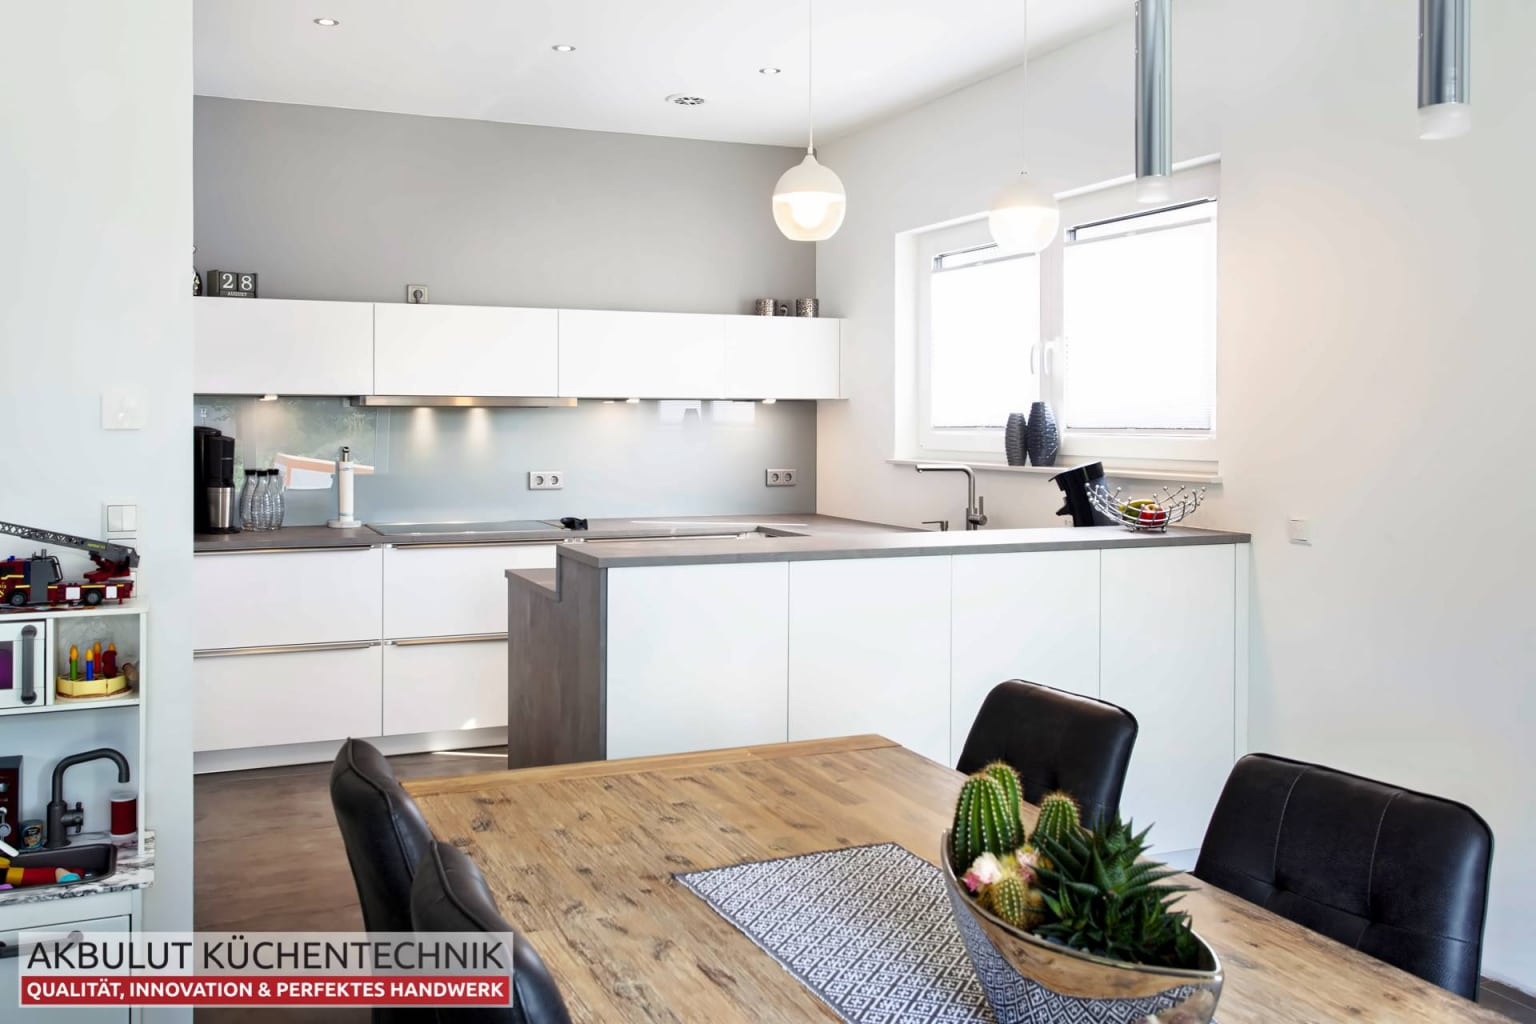 U Küche in Beteonoptik mit langen Theke (5)